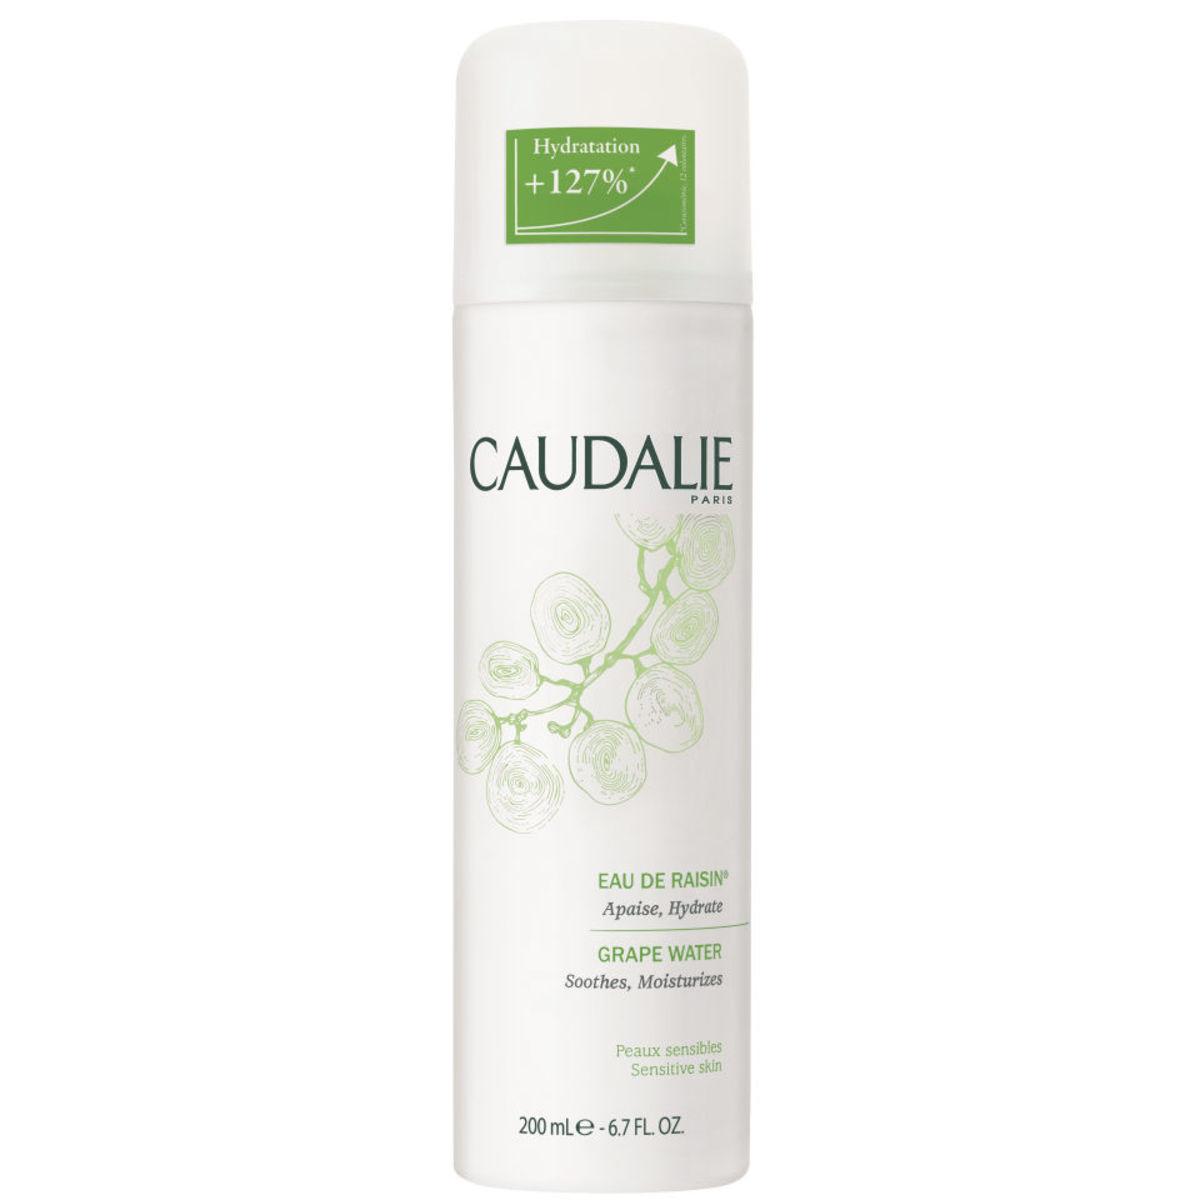 Caudalie Grape Water 歐緹麗 有機葡萄籽水保濕噴霧 200ml 白綠